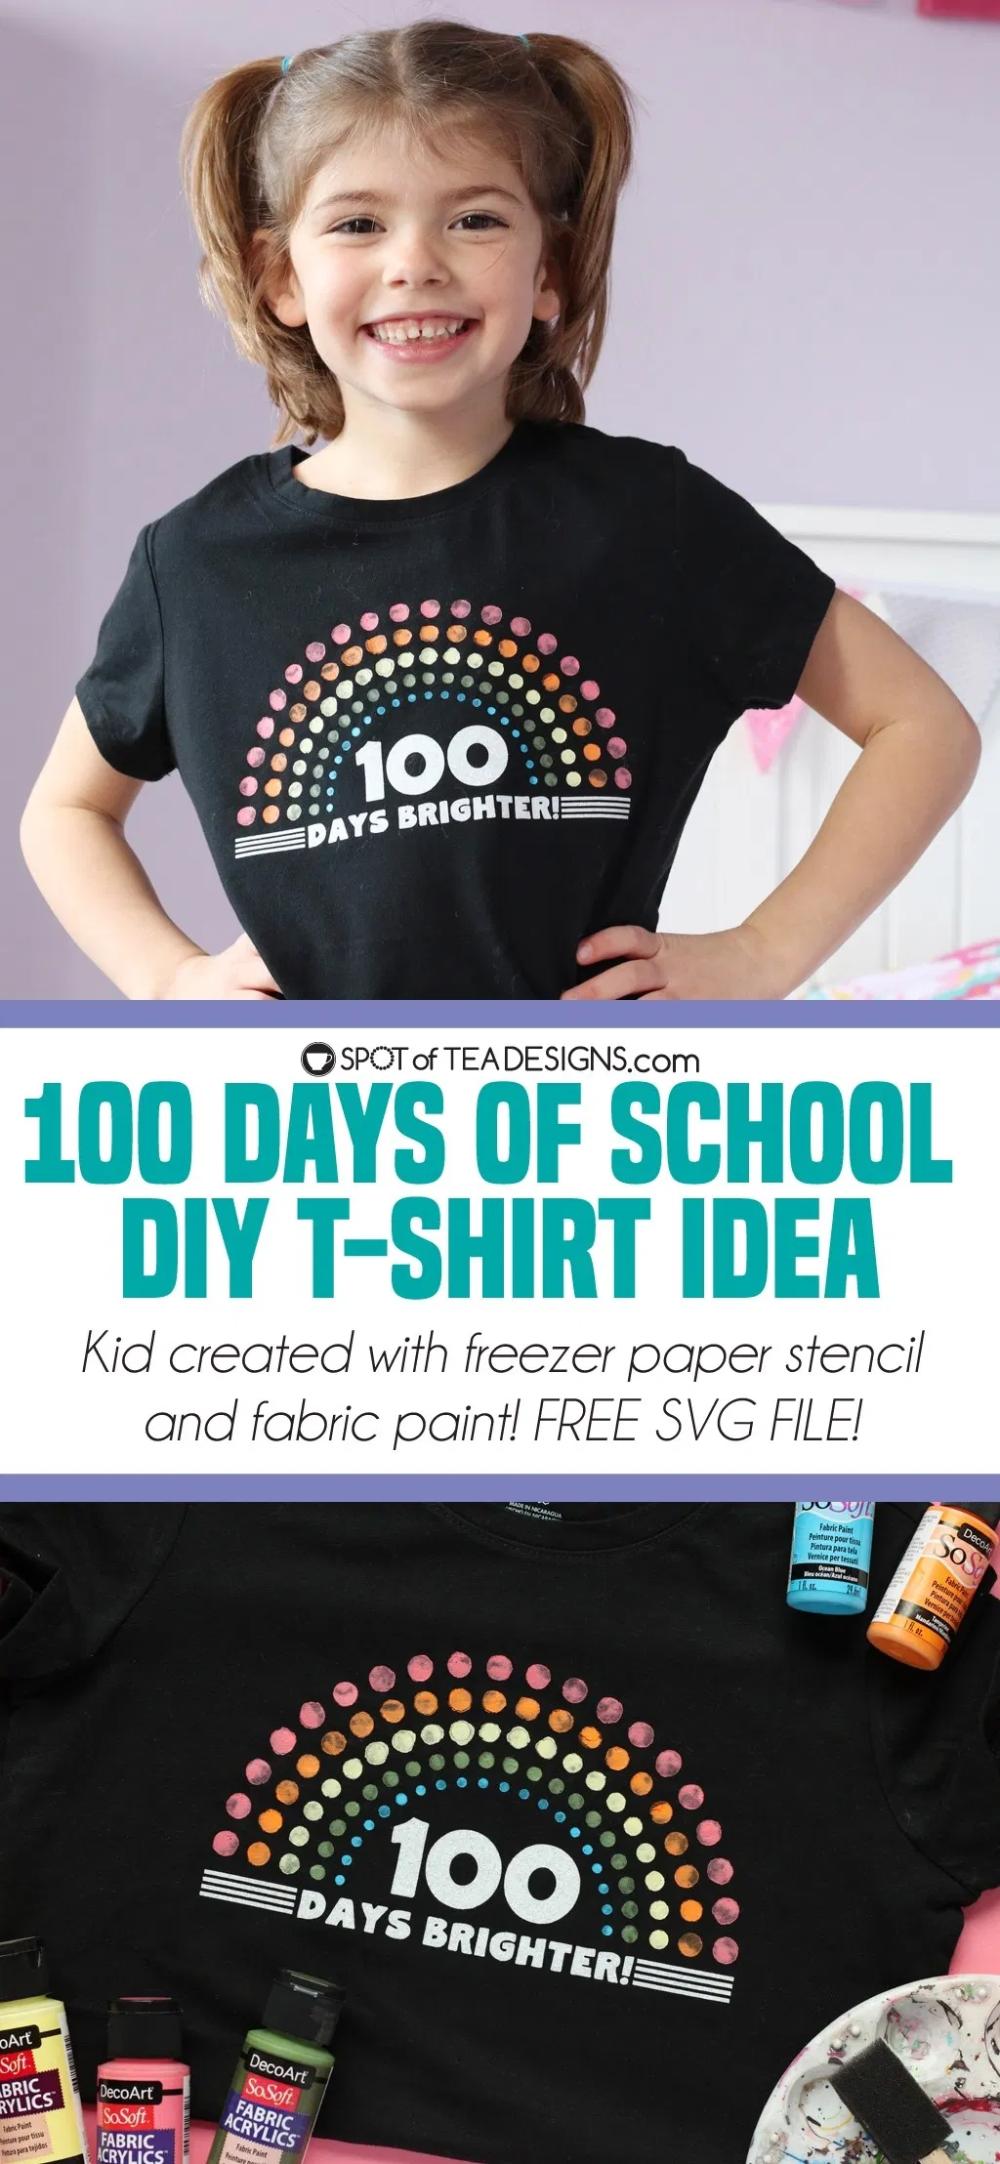 100 Days Of School T Shirt 100 Days Brighter Spot Of Tea Designs Decoart Sosoft Fabric Acrylics In 2020 100 Days Of School Tea Design School Tshirts